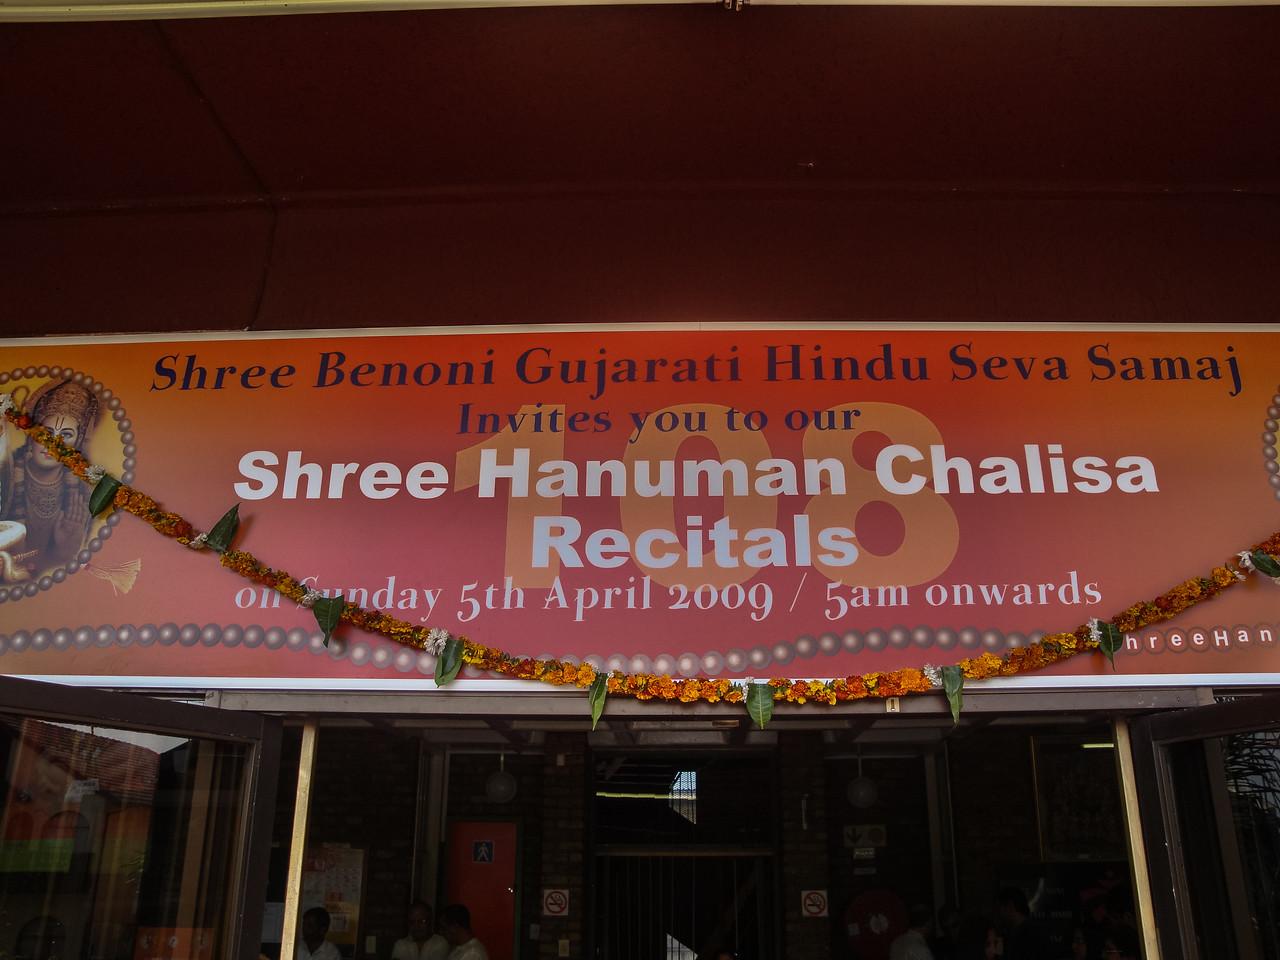 Shree Benoni Gujarati Hindu Seva Samaj, South Africa